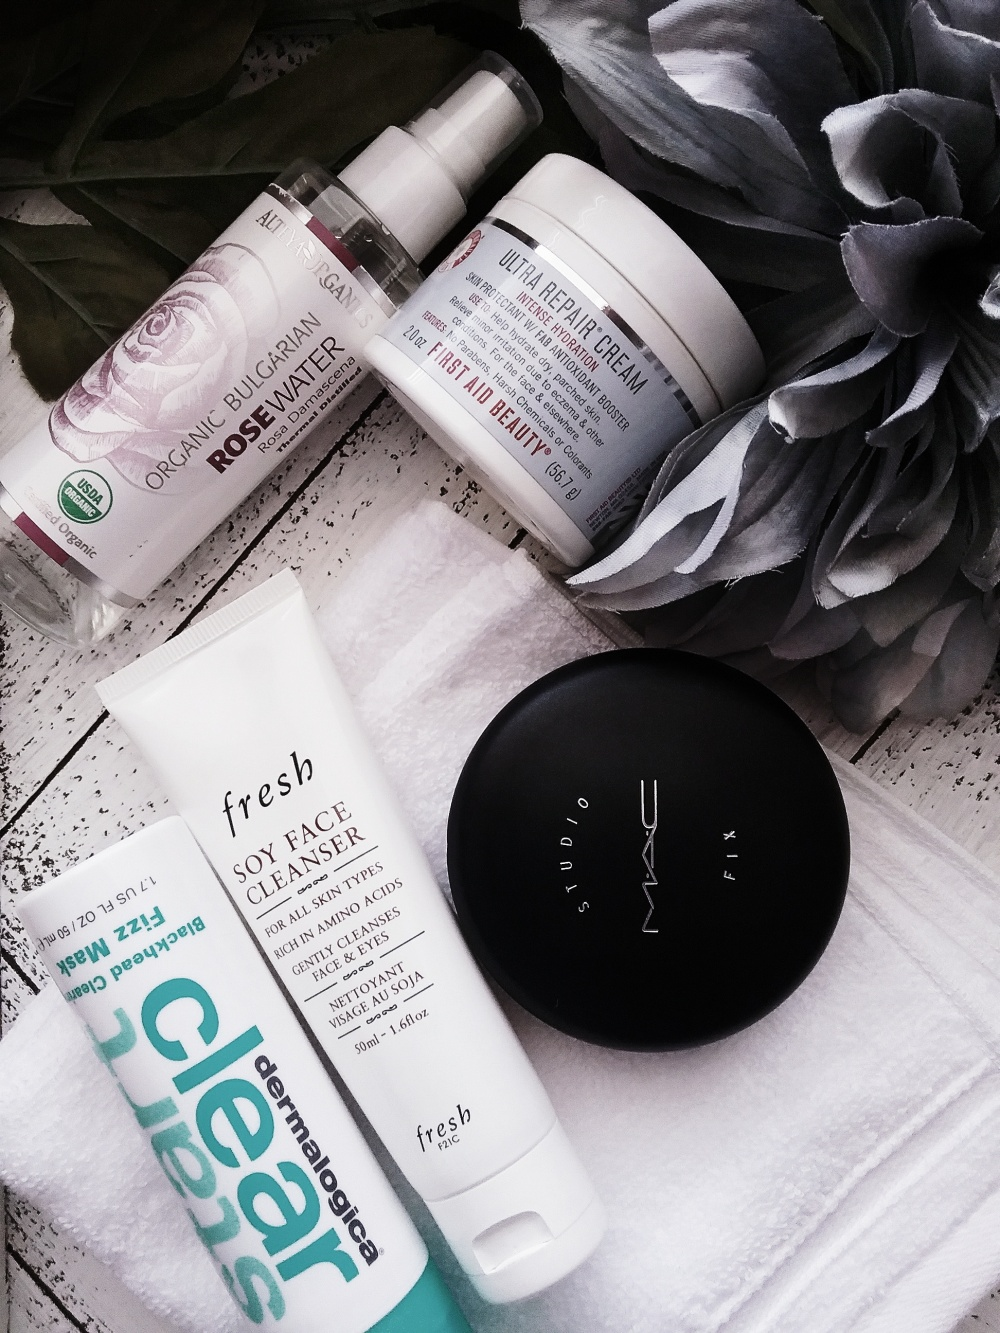 JustNatonya Top 5 Summer Beauty Favs for Sensitive Skin